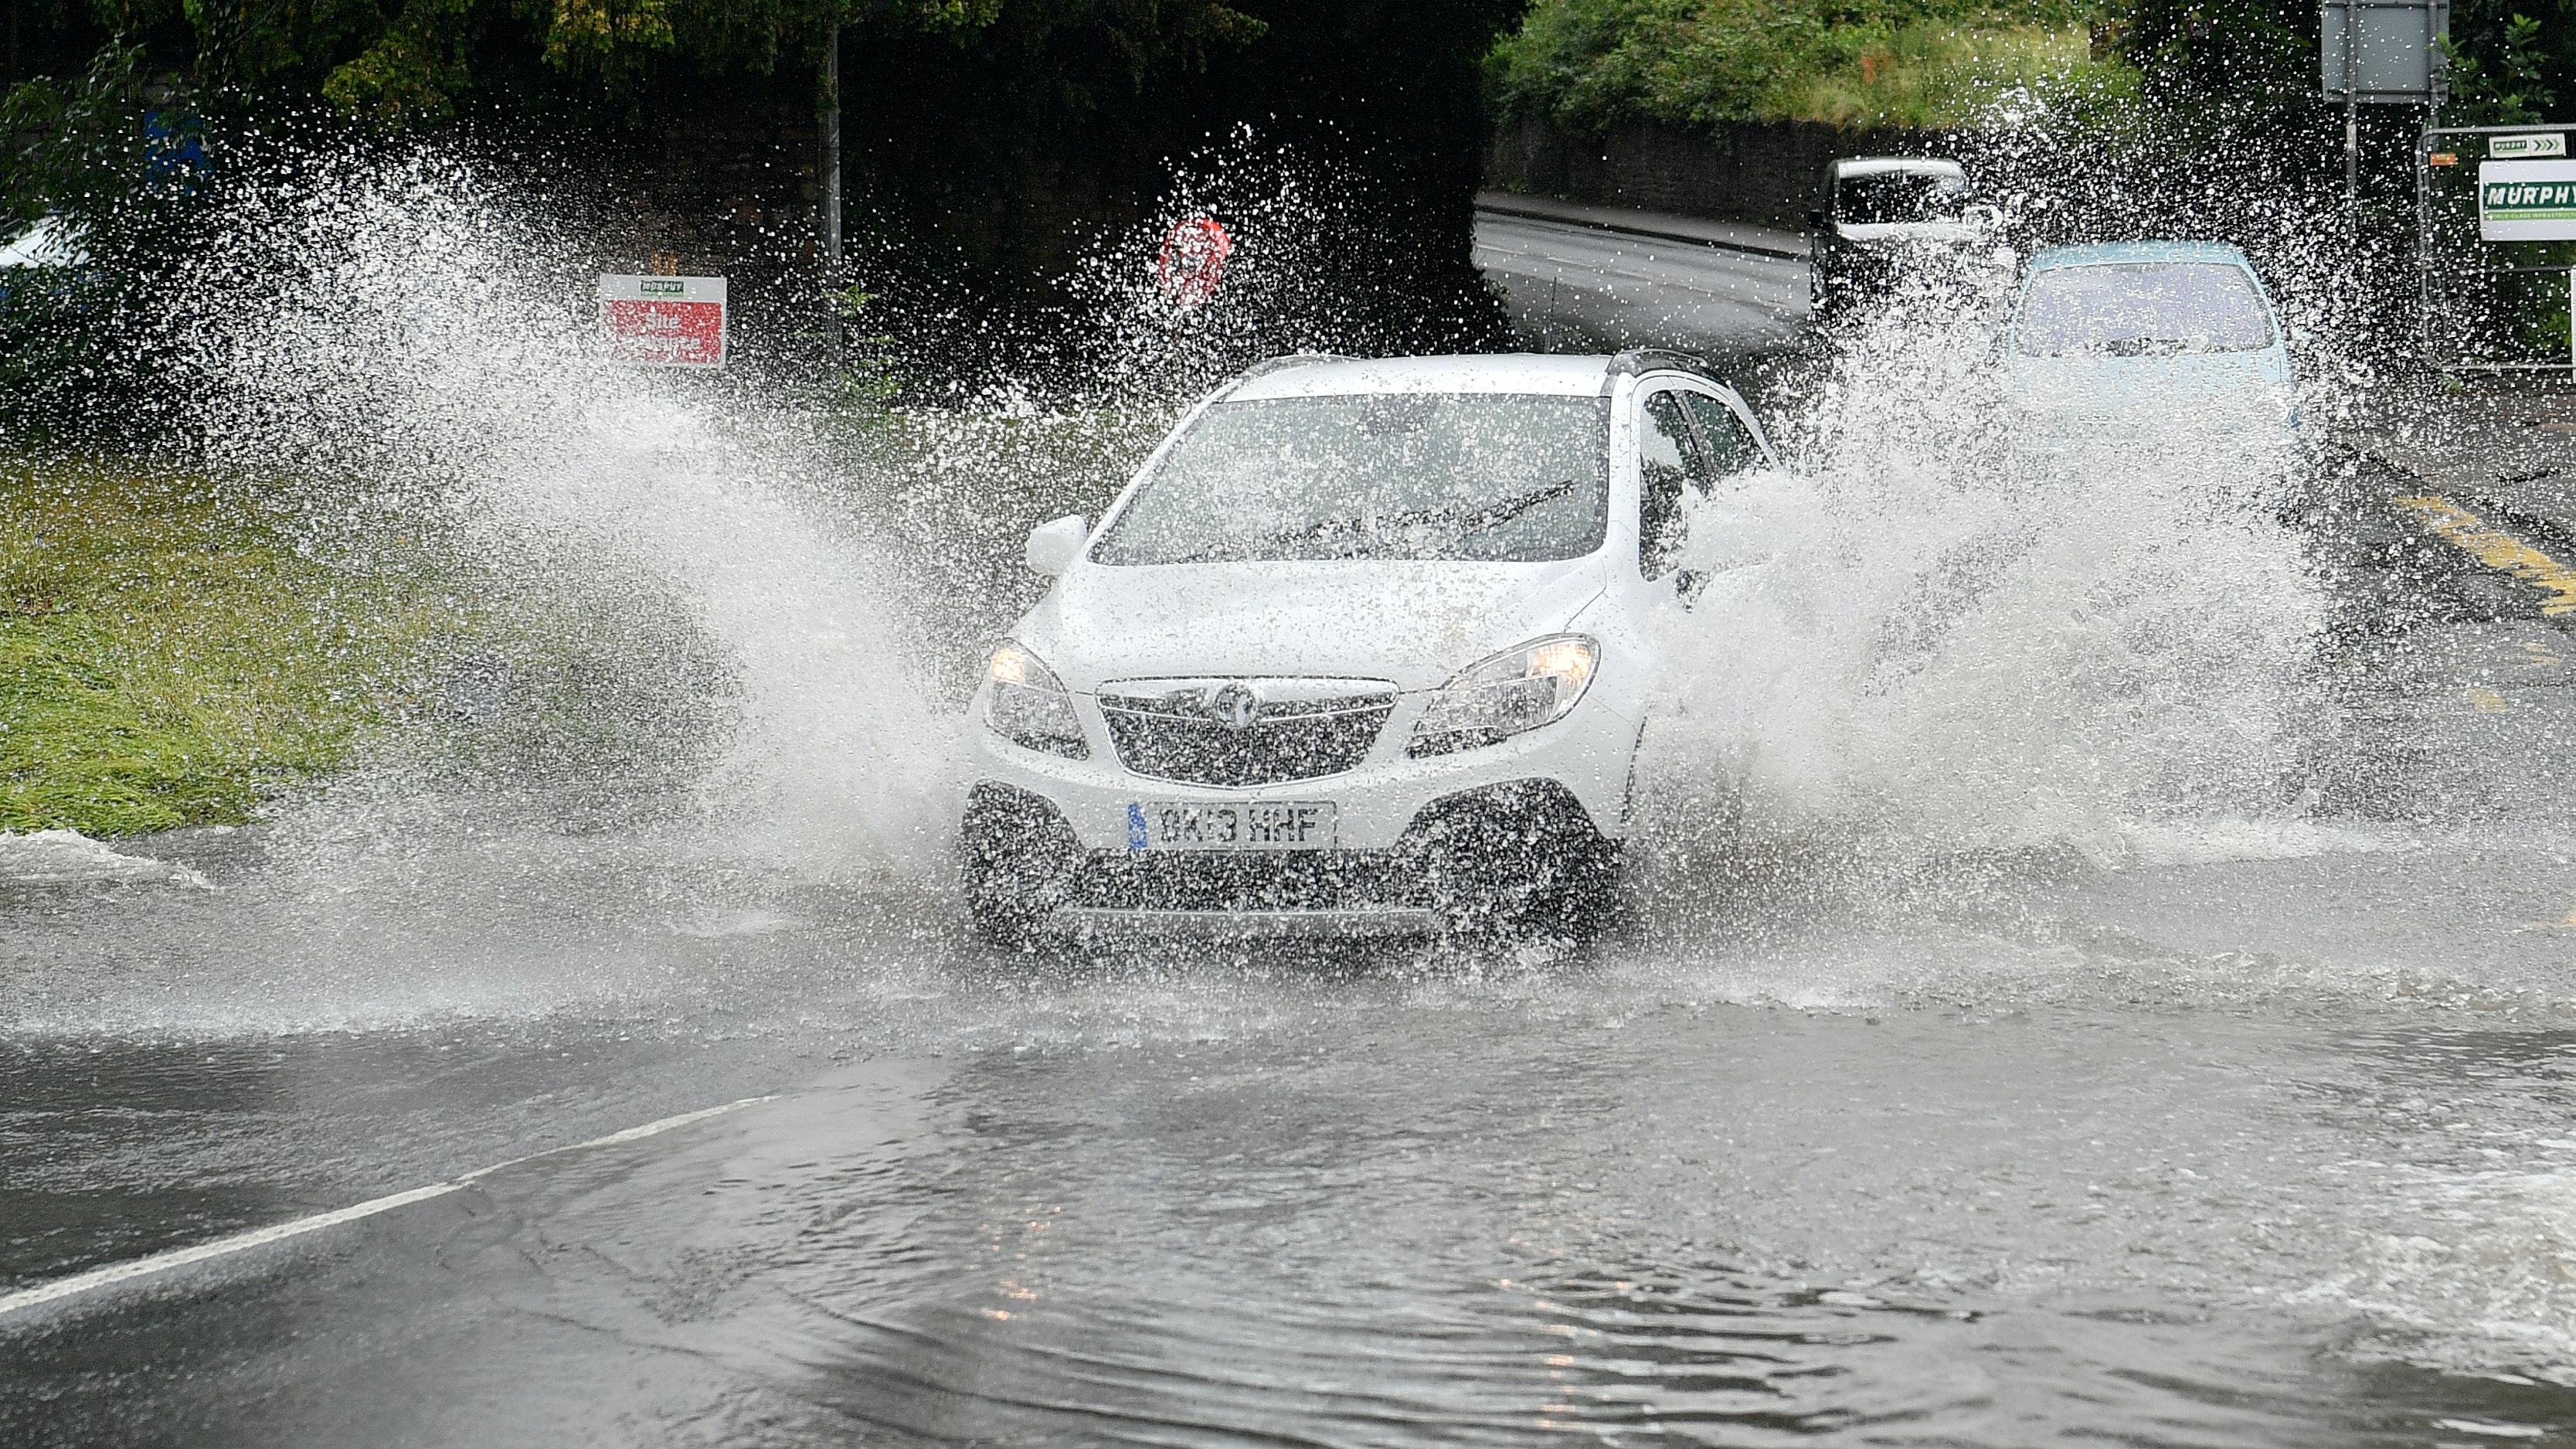 Rain, Wind Make for Miserable Day in DC Area - NBC4 Washington